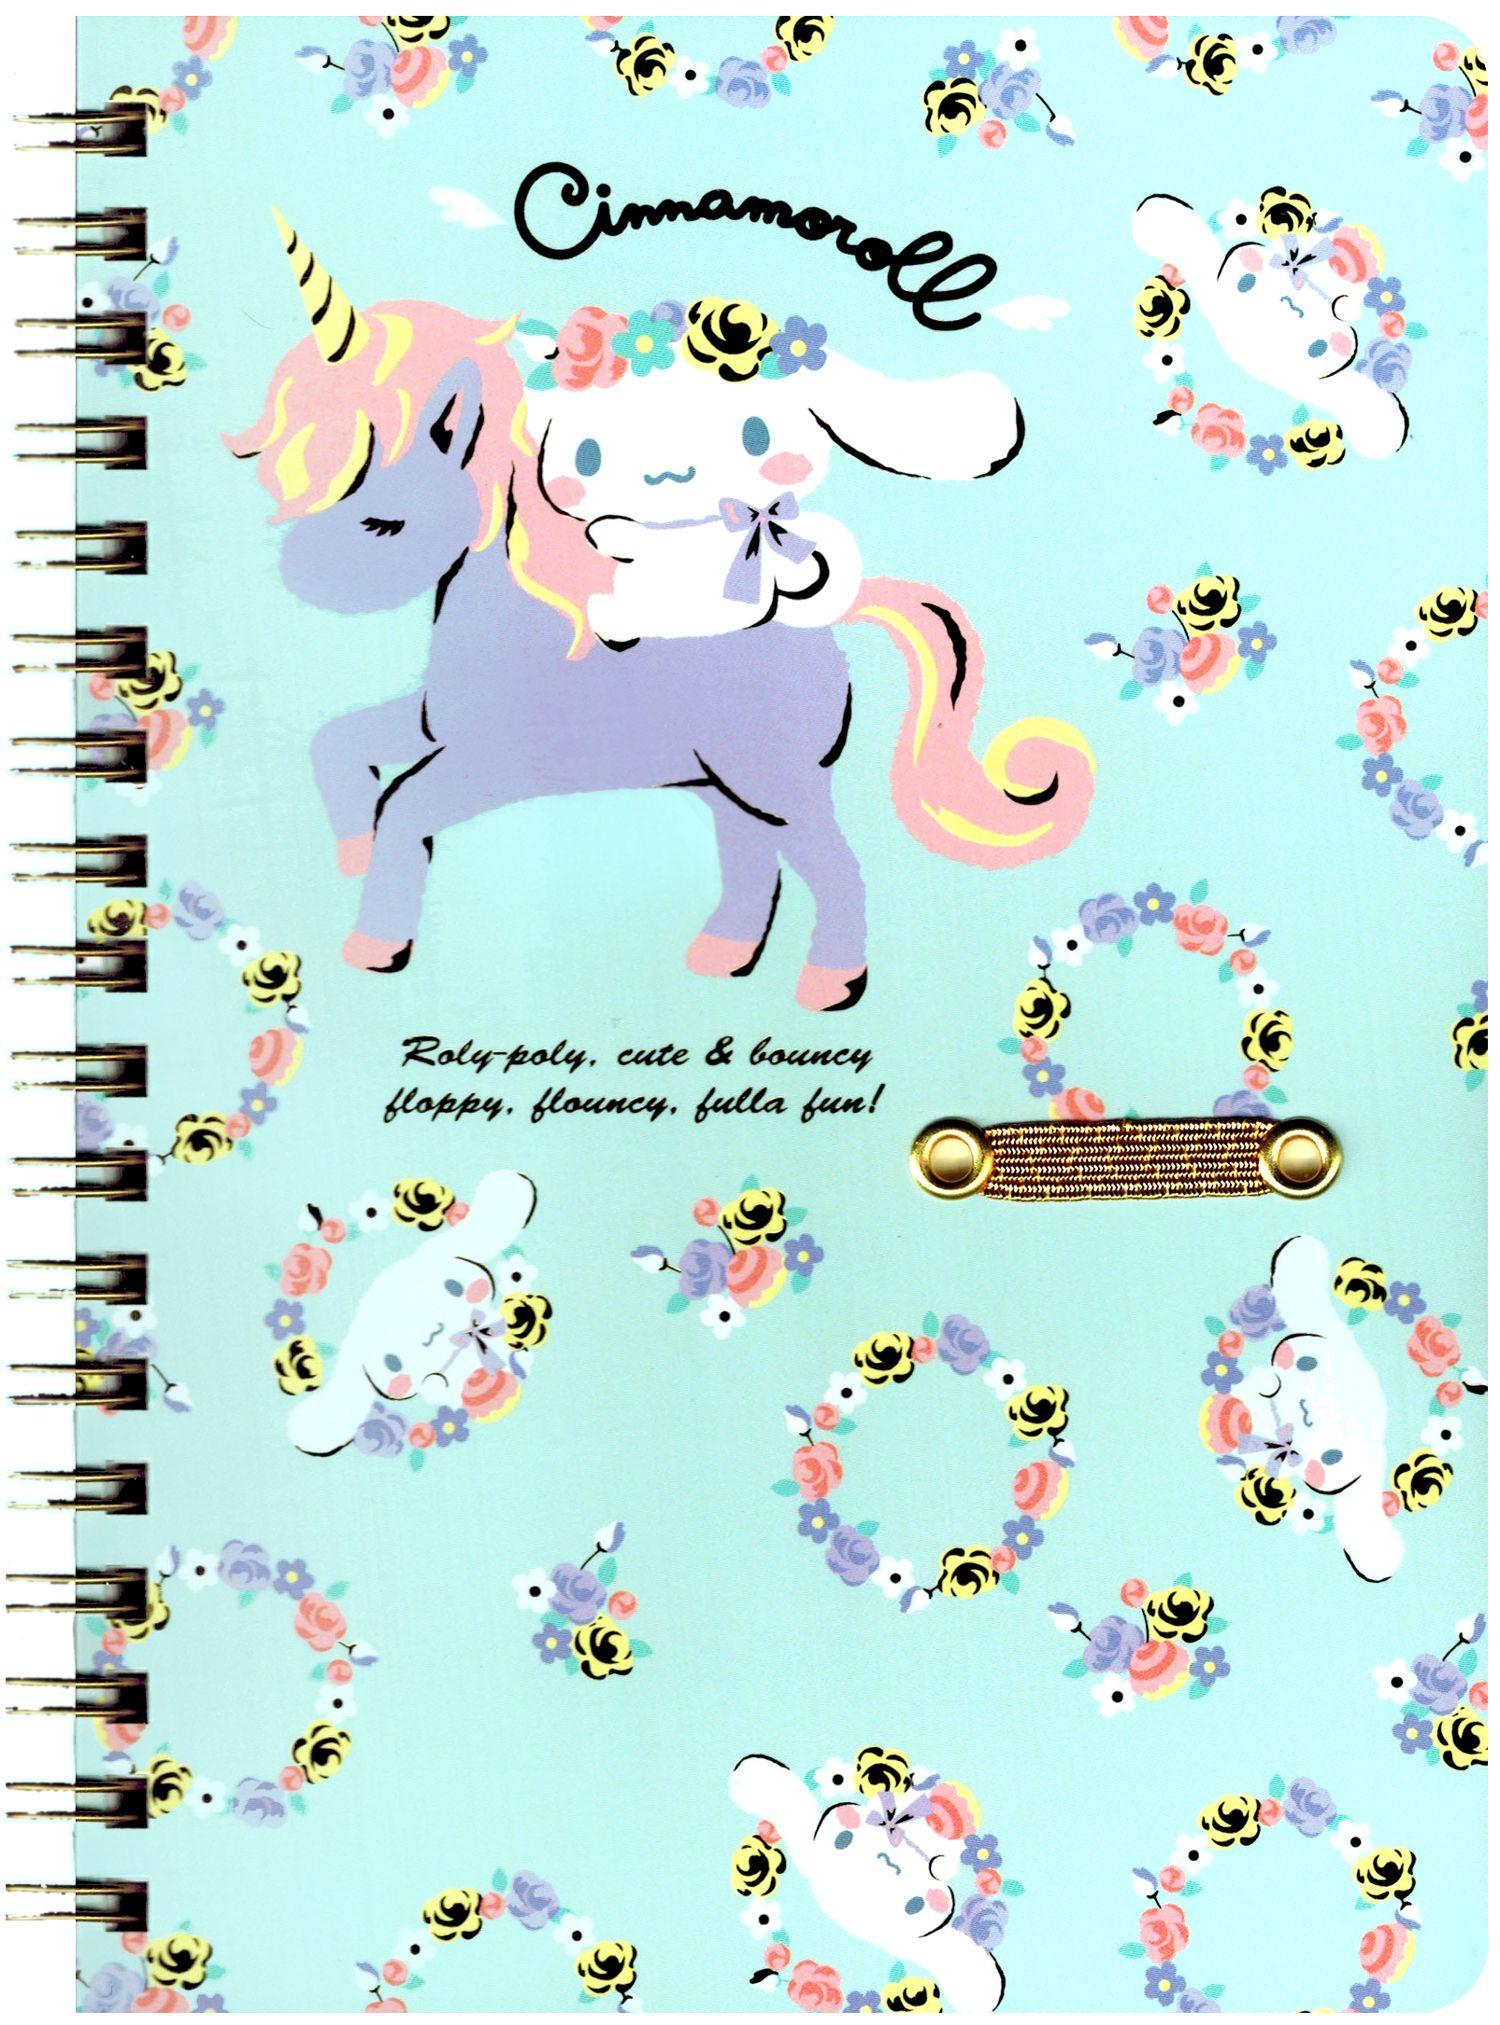 Sanrio Cinnamoroll Unicorn B6 Hard-Cover Notebook